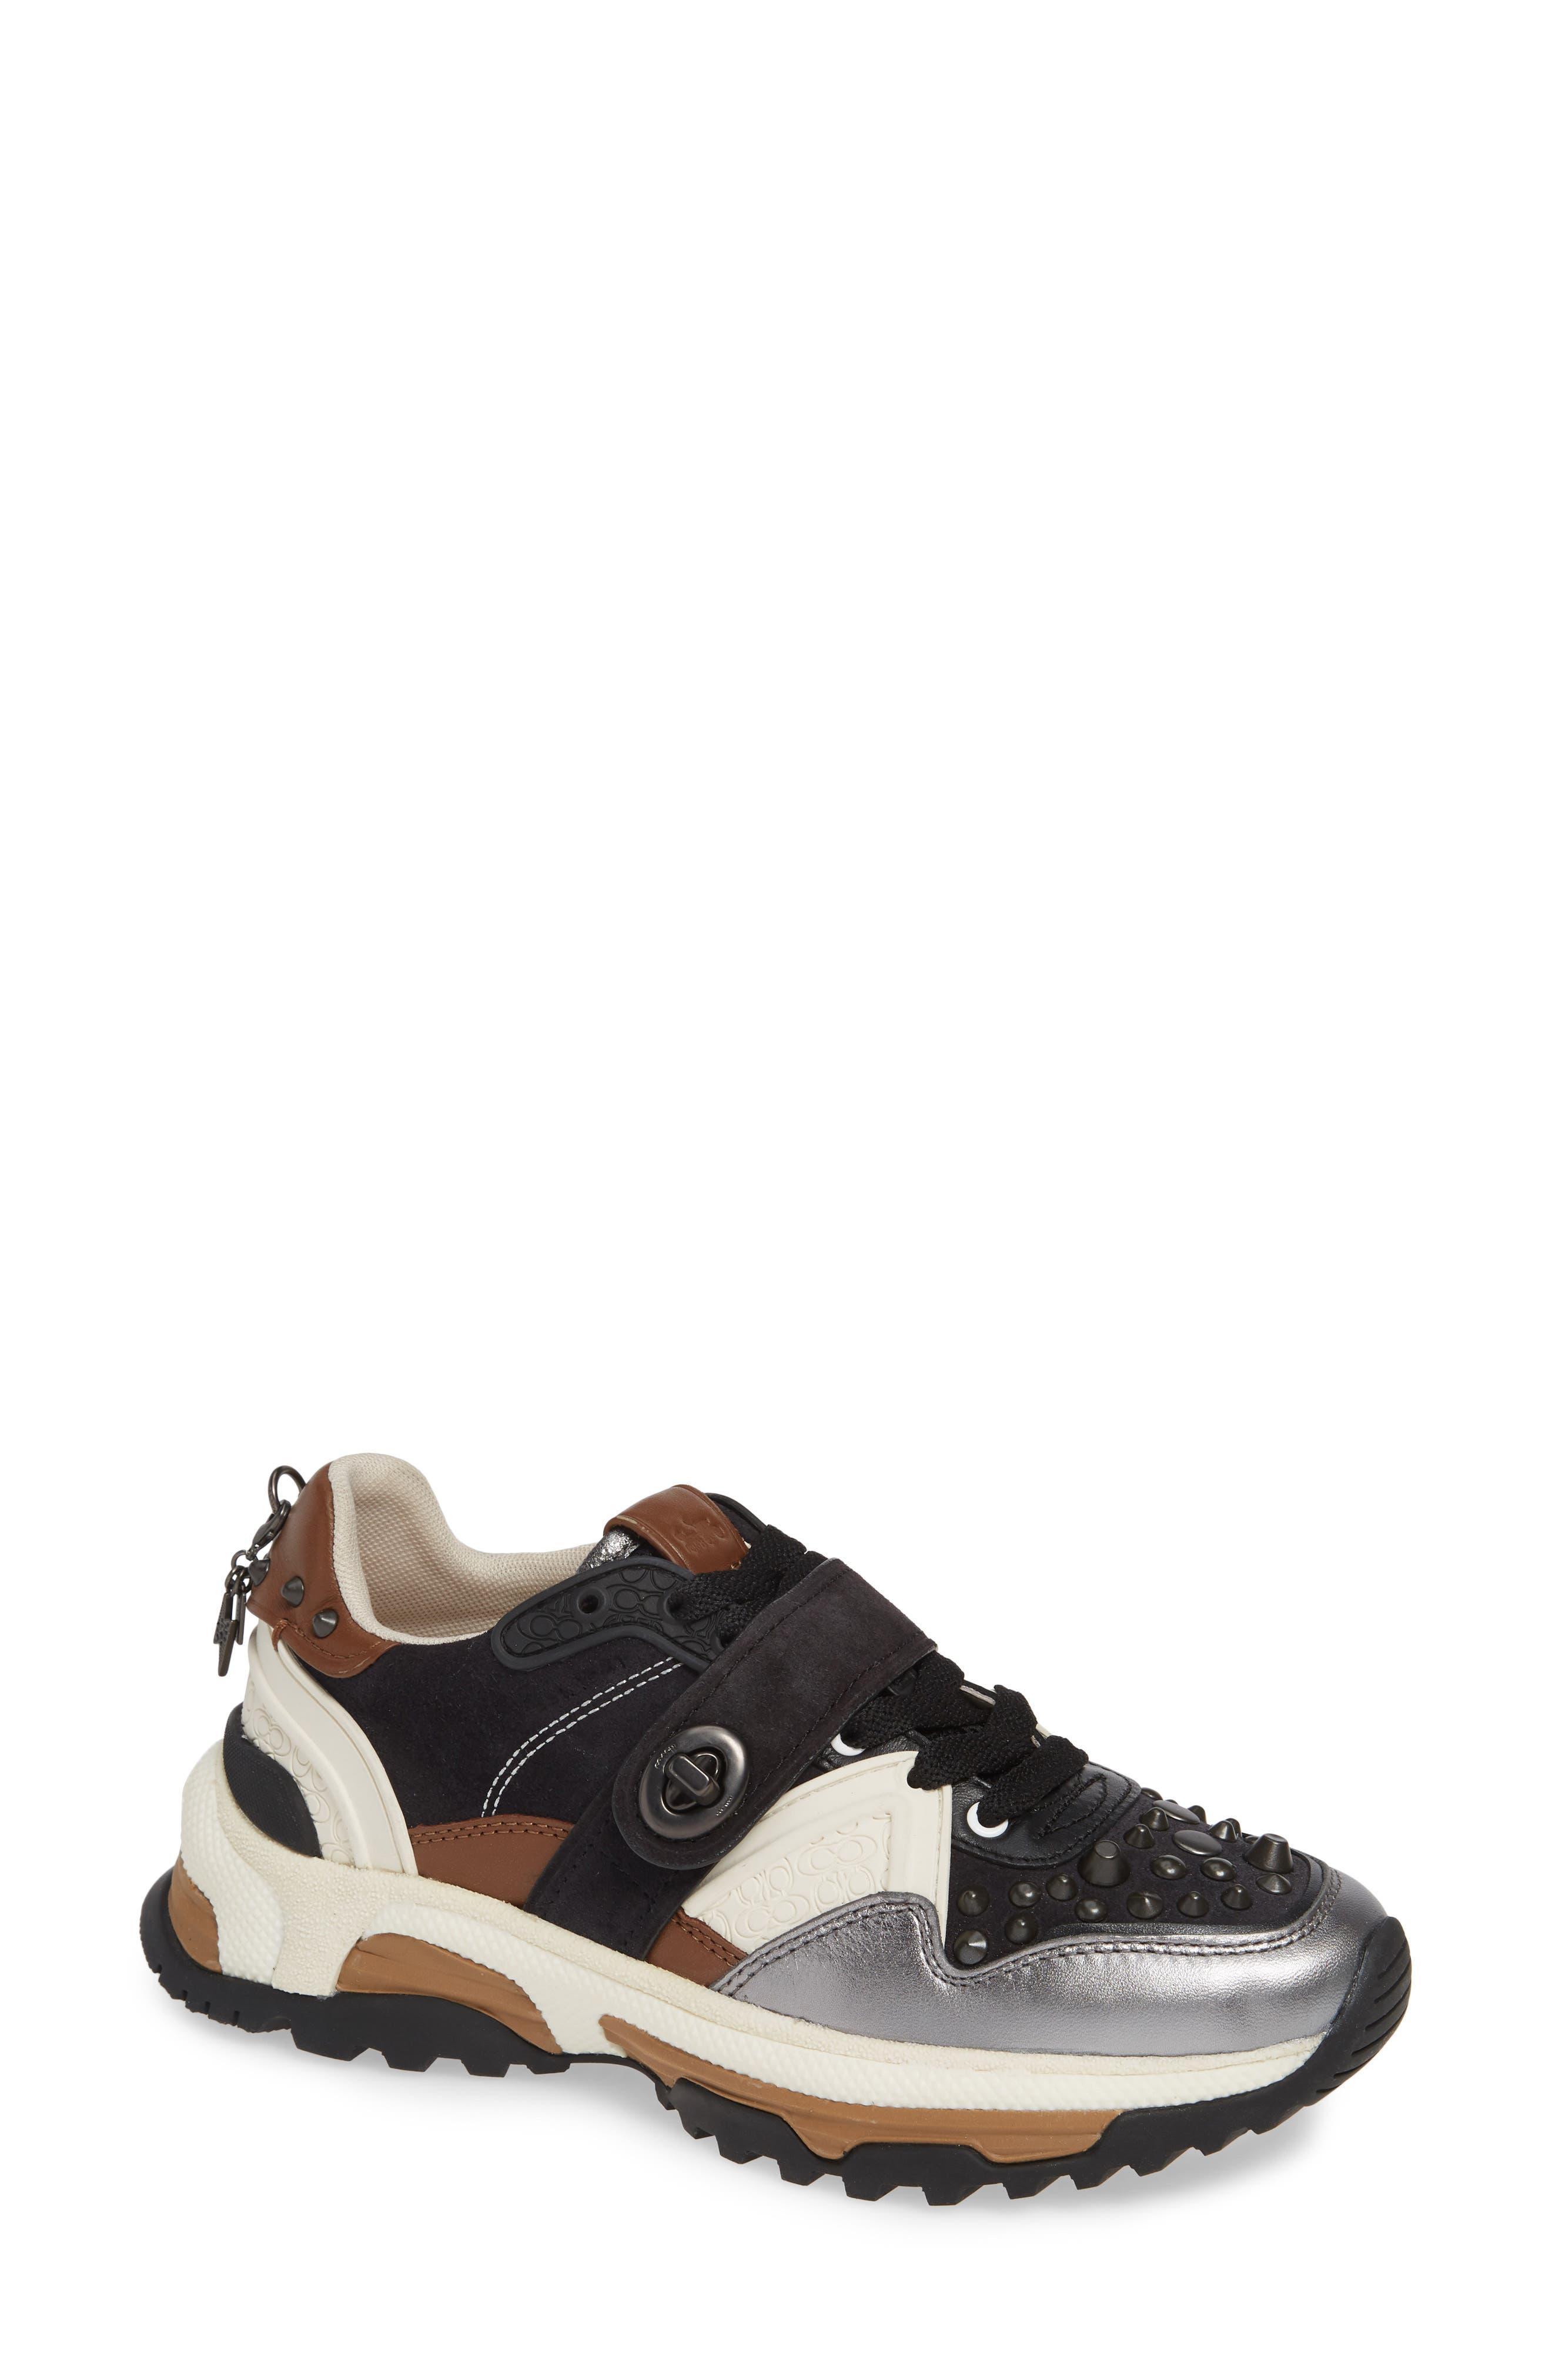 C143 Studded Sneaker,                             Main thumbnail 1, color,                             BLACK/ GUNMETAL LEATHER